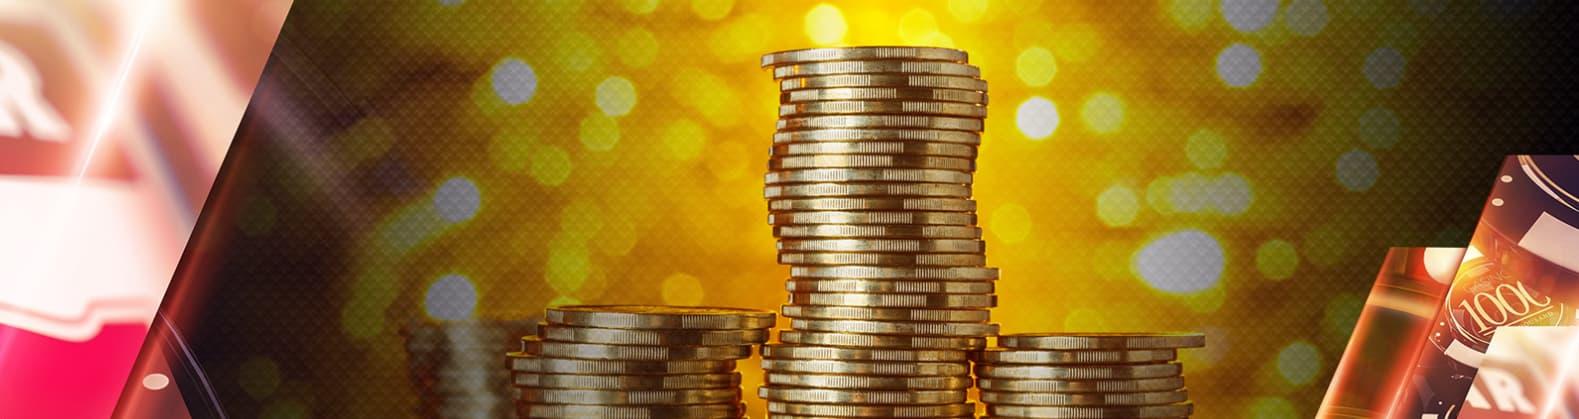 Guld mønter i en stak